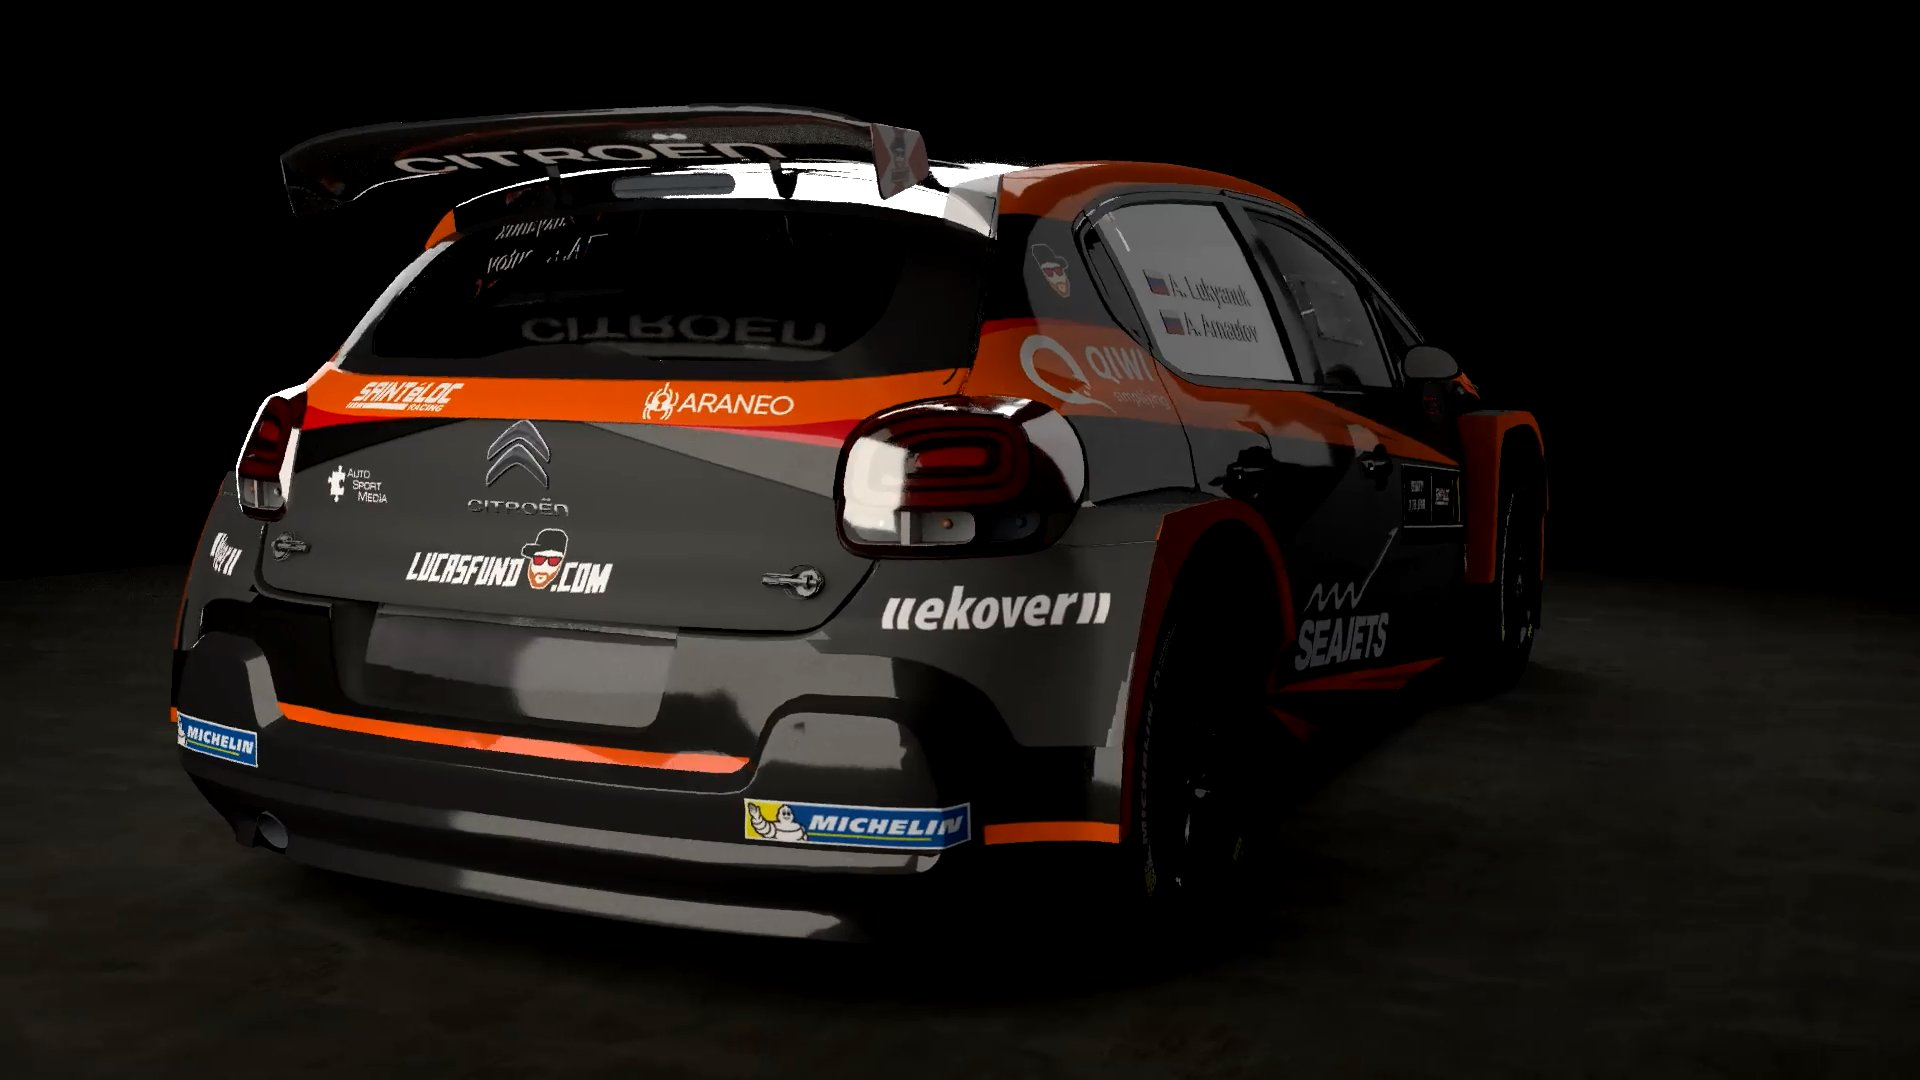 FIA European Rally Championship: Temporada 2019 - Página 2 D0Z1aVXWoAIRwDd